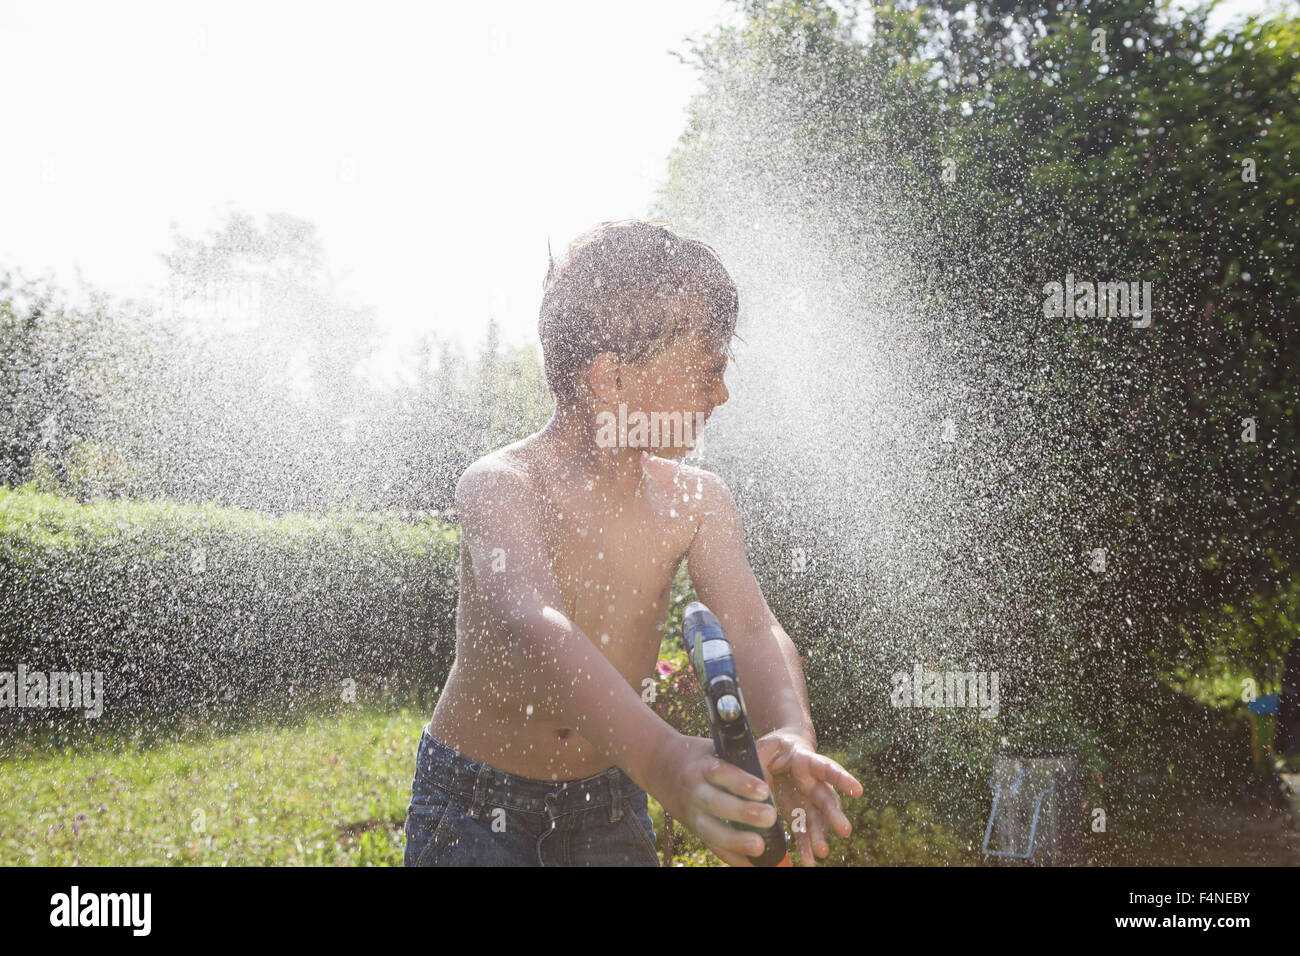 Boy splashing with water in garden - Stock Image